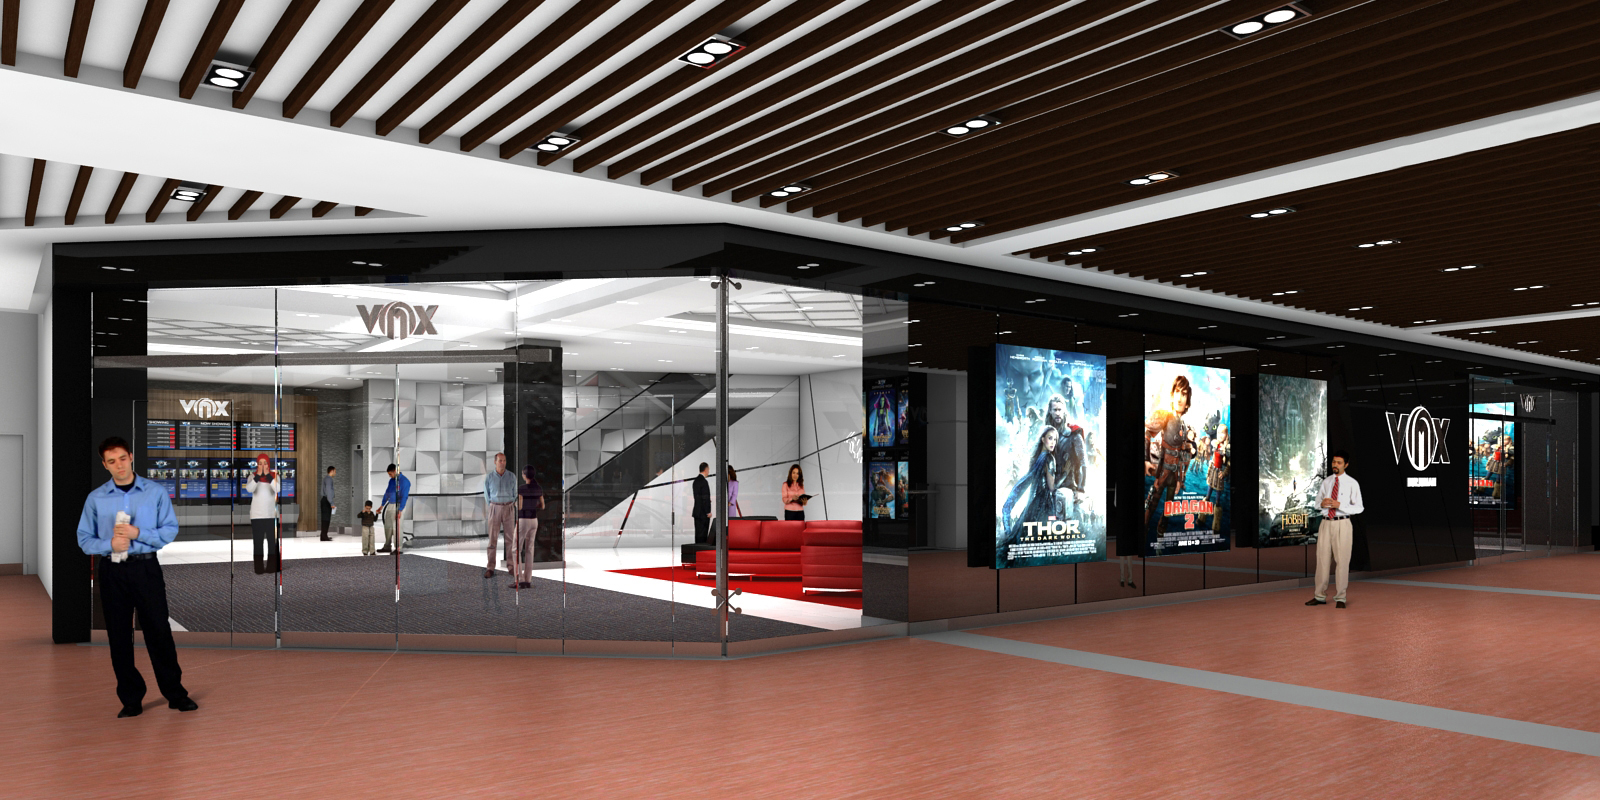 14 new cinema screens, boutique cinema for kids open in Dubai - News -  Emirates - Emirates24|7